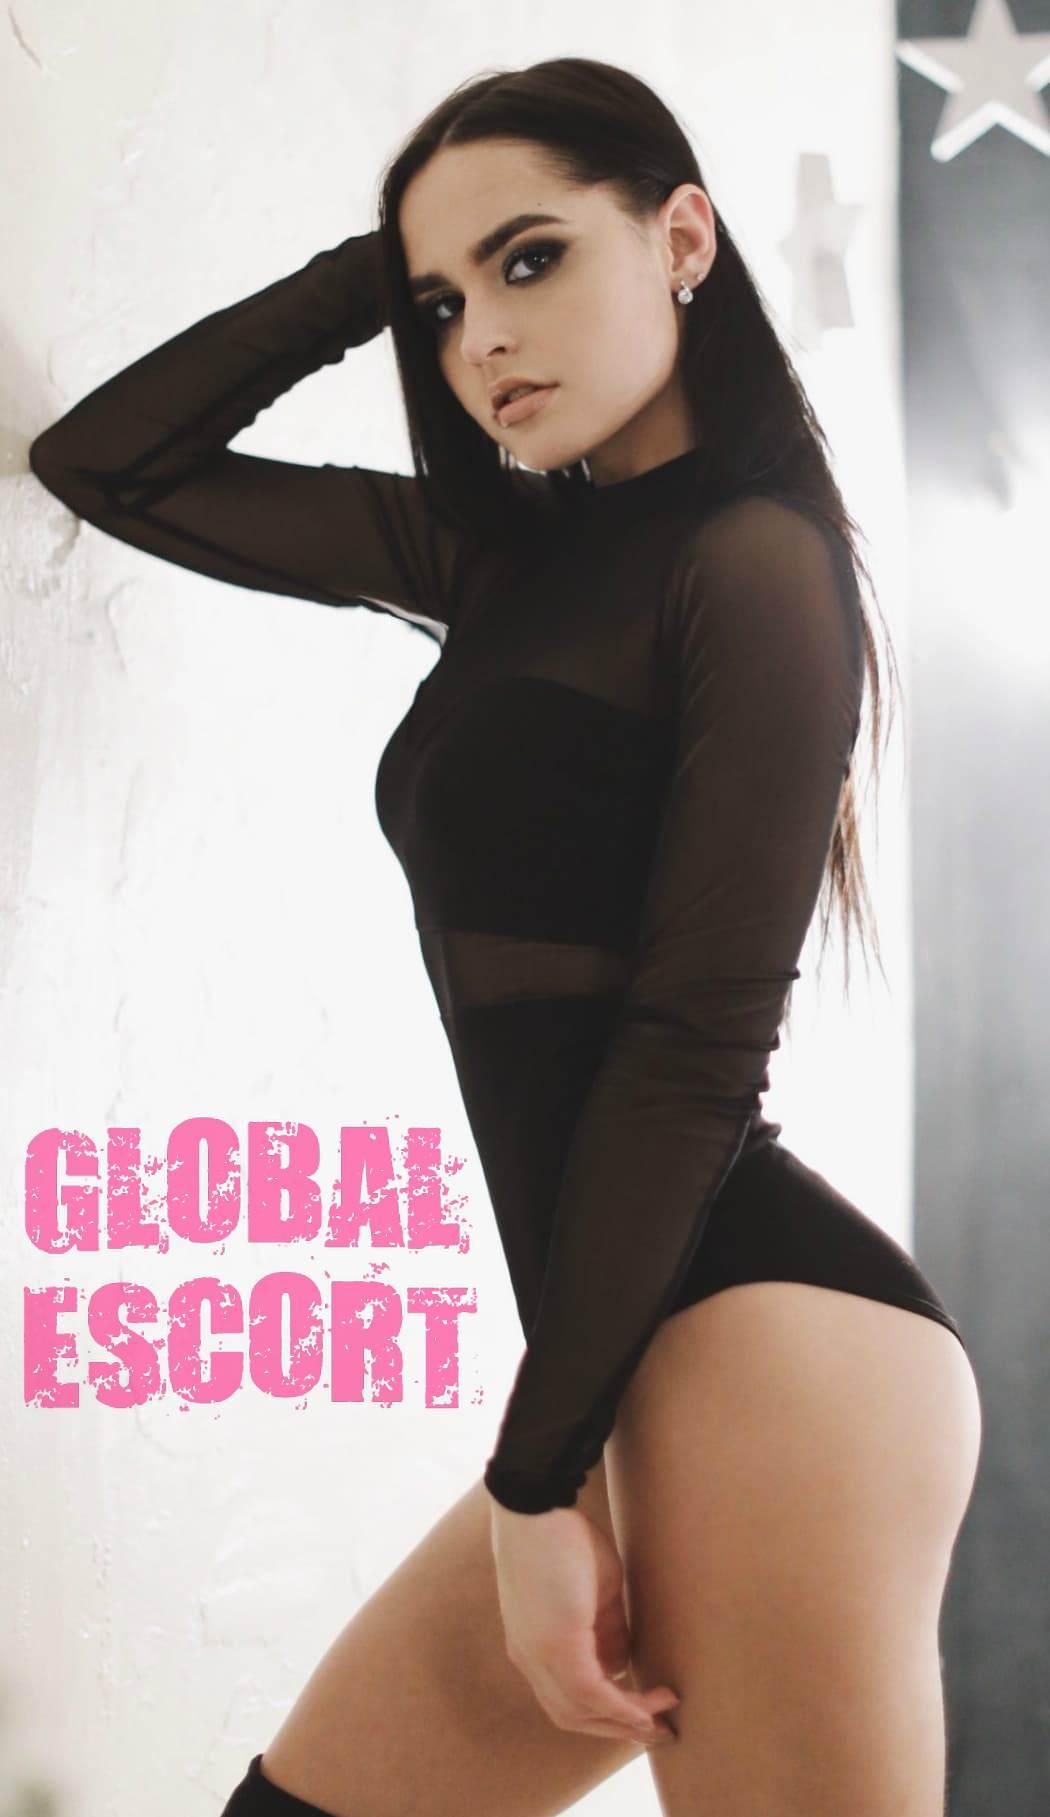 sexy brunette escort in black lingerie in the room